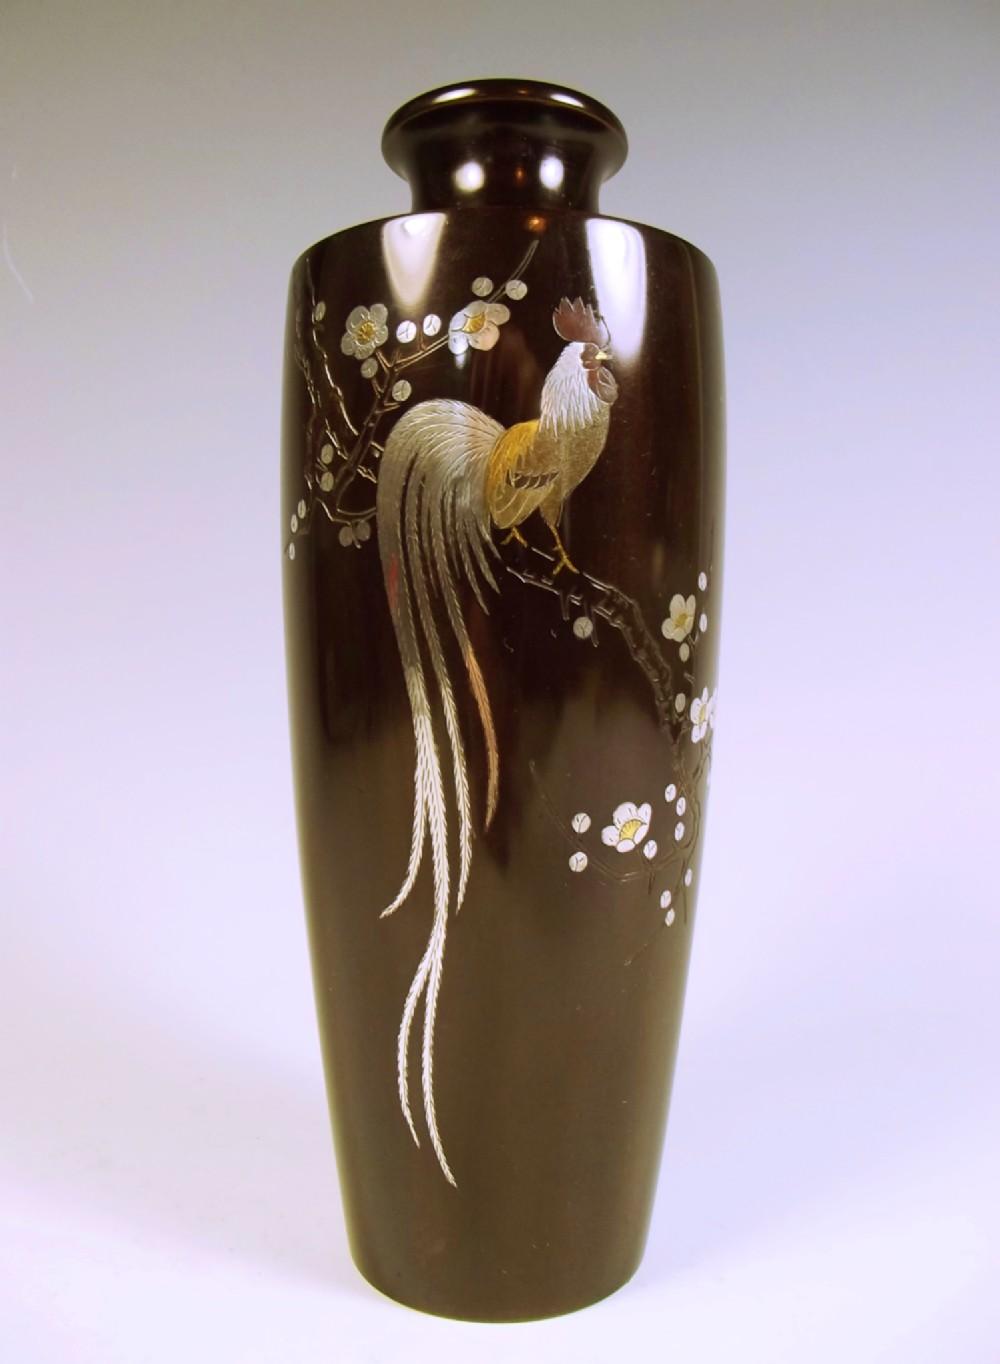 japanese bronze cockerel vase silver and gold inlay meiji period